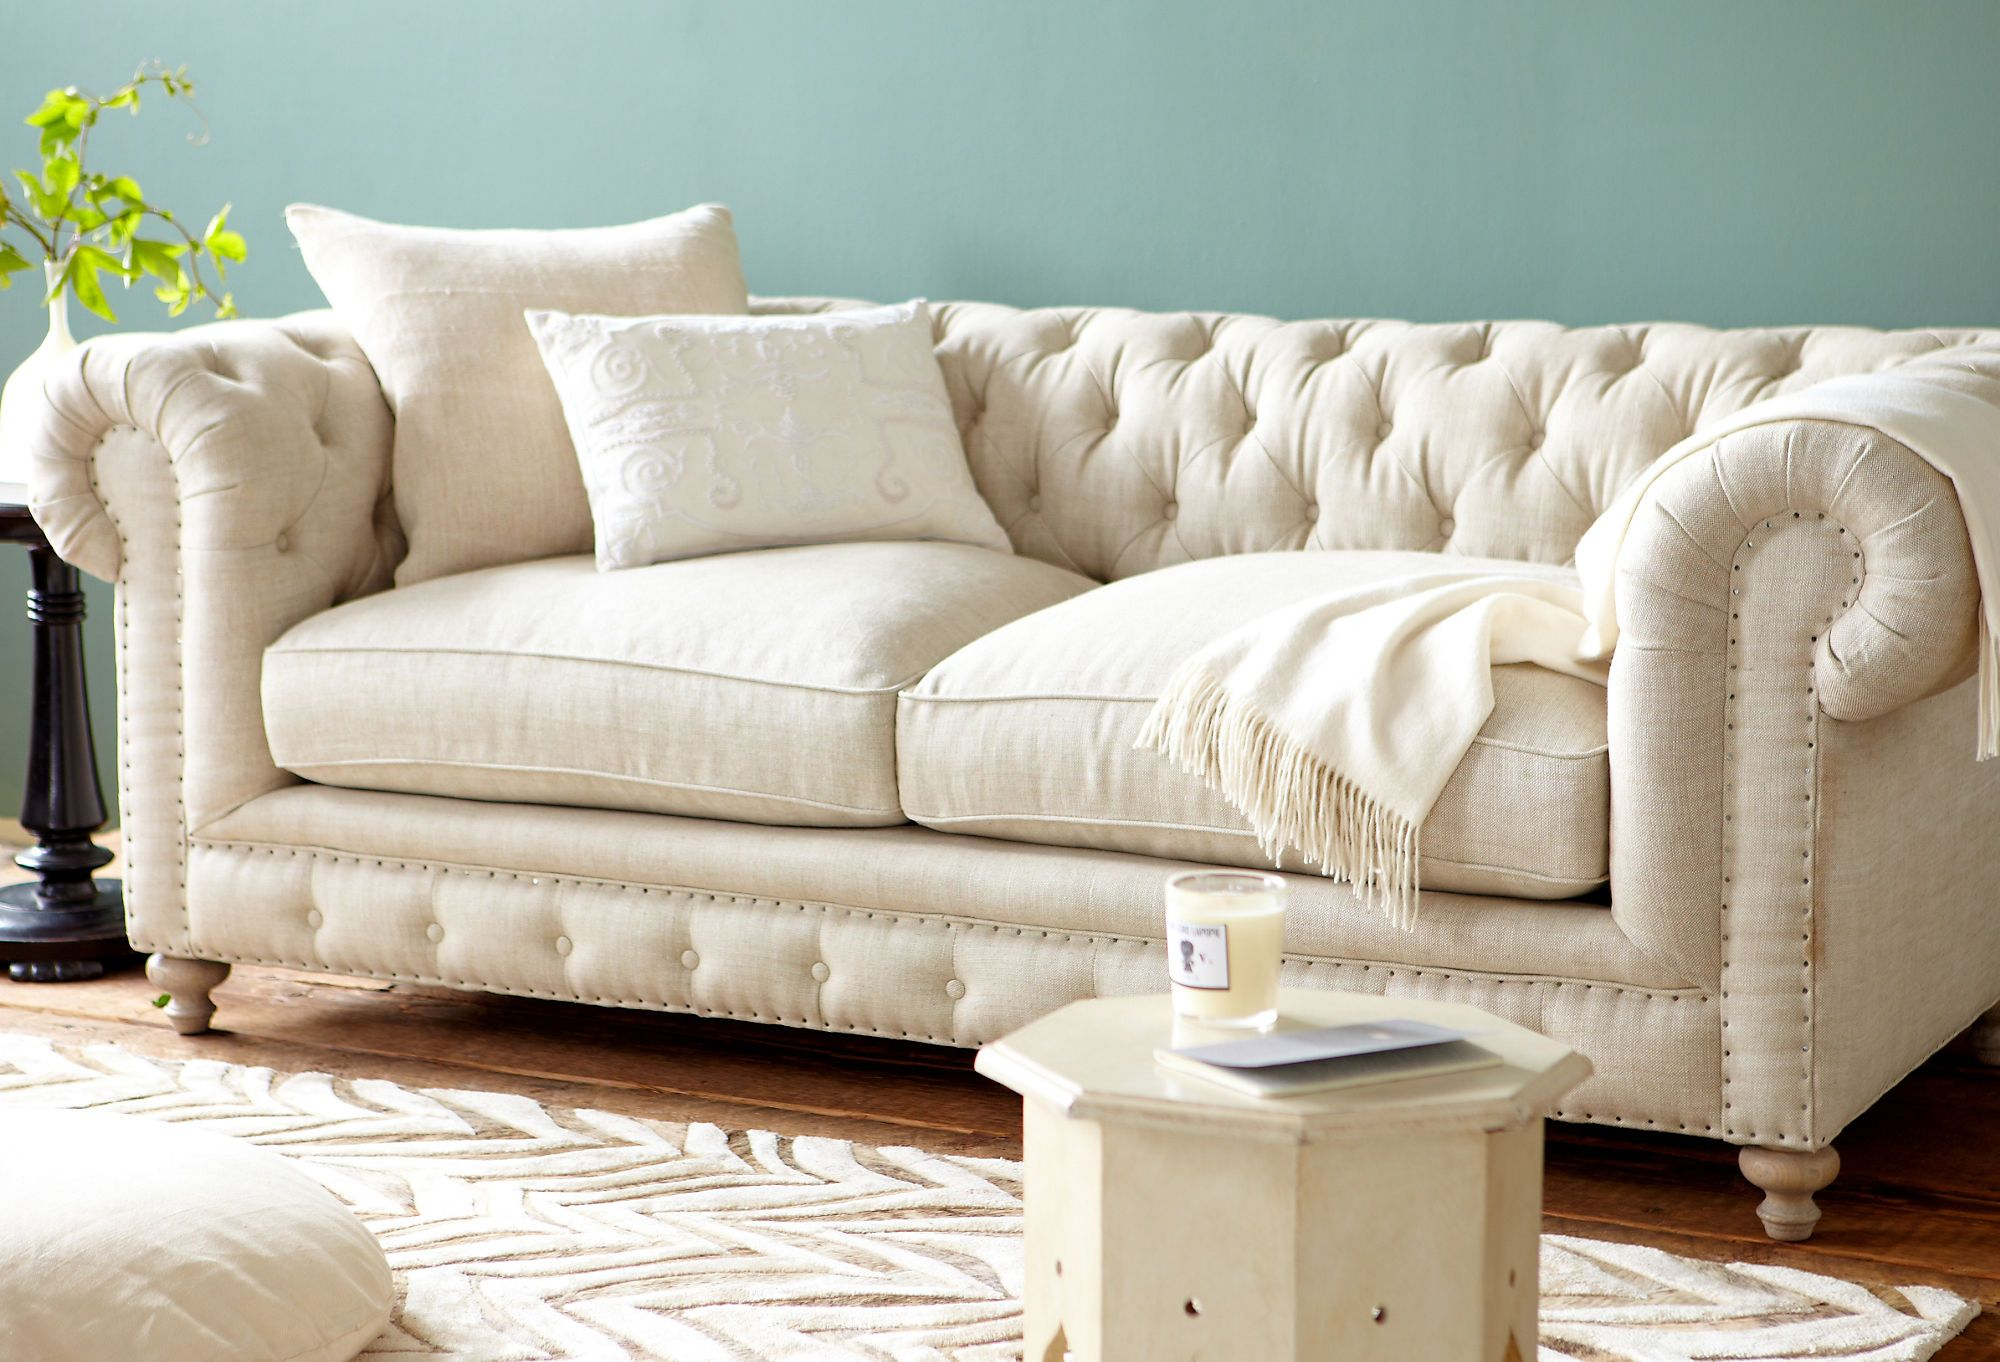 Finn 90 Tufted Linen Sofa Cream Classic With A Twist One Kings Lane Furniture Sofa Home Decor